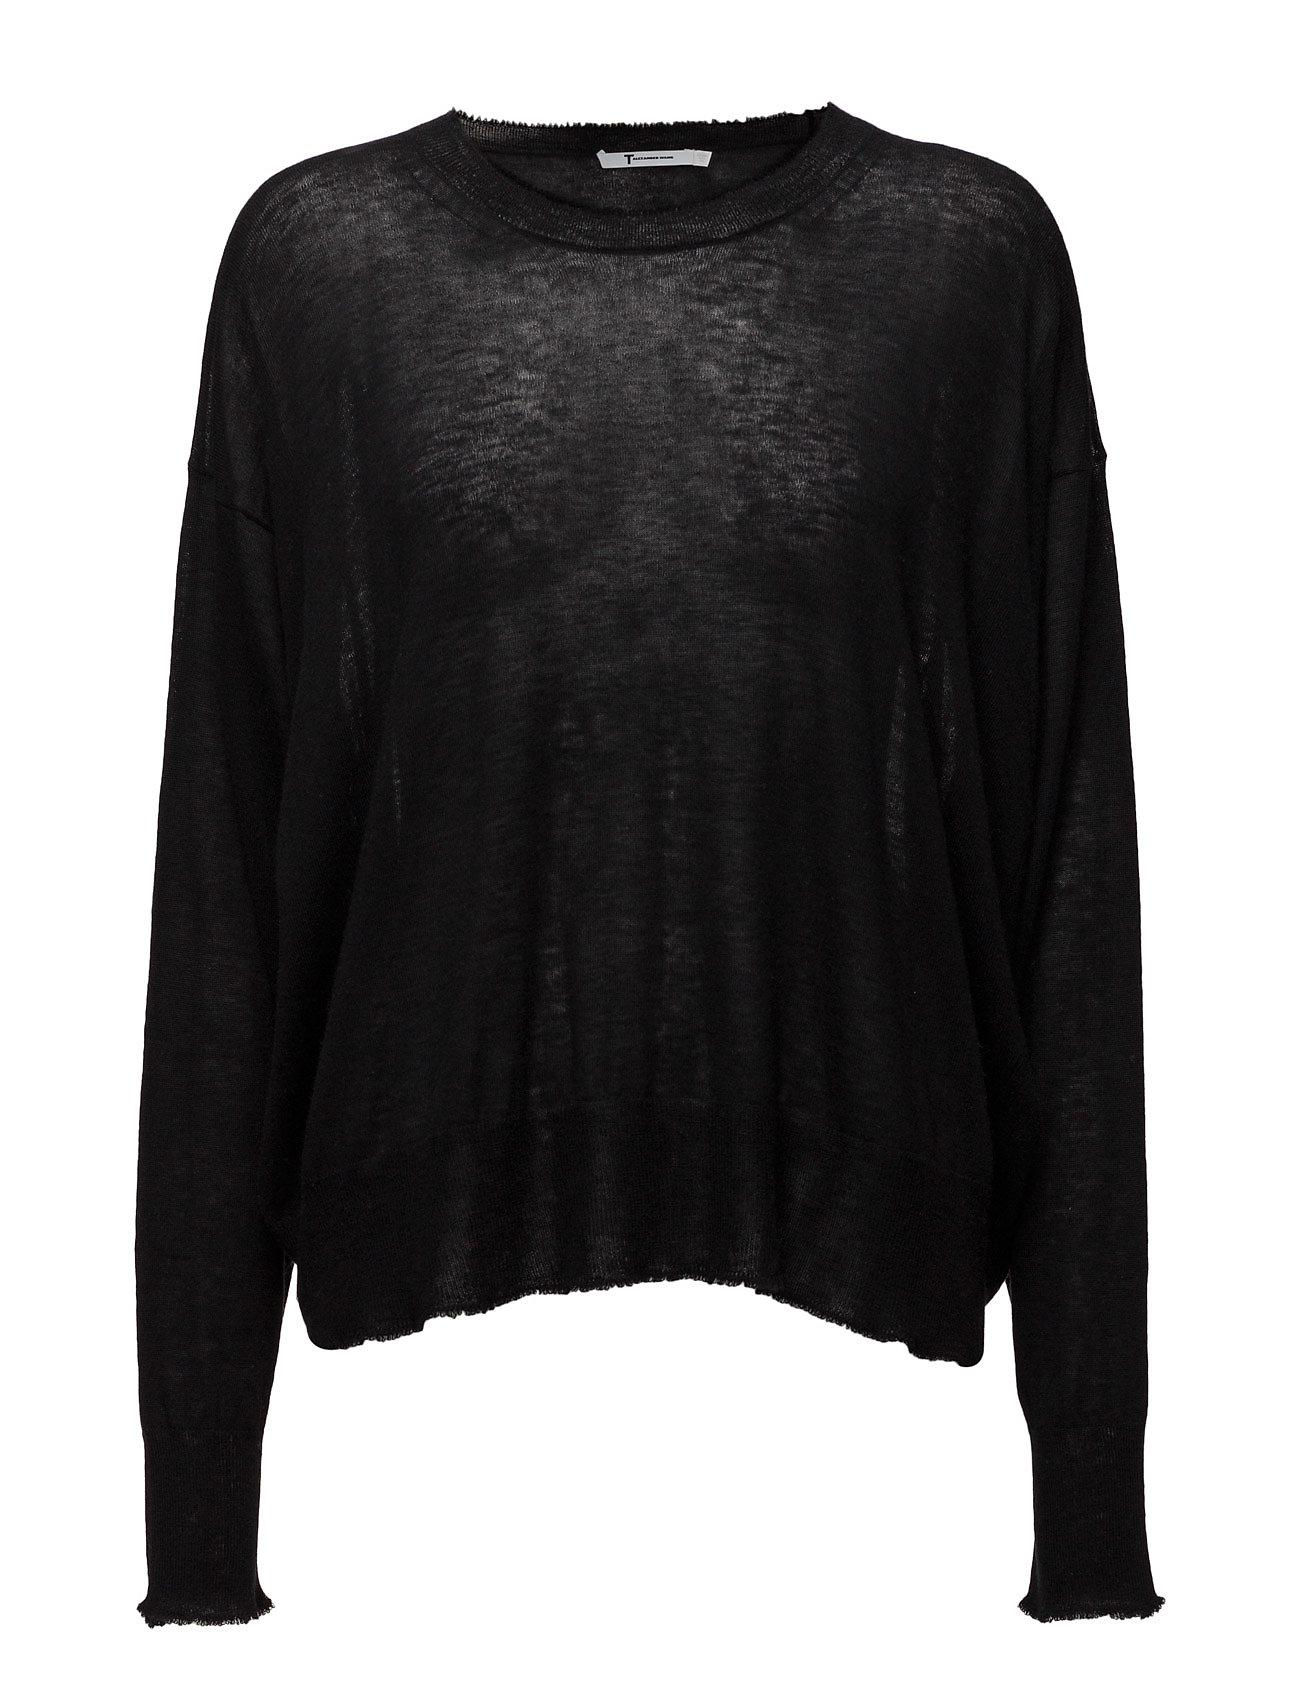 Gauze Cashmere Nylon Knitoversized Crew Pullover T by Alexander Wang Sweatshirts til Damer i Sort